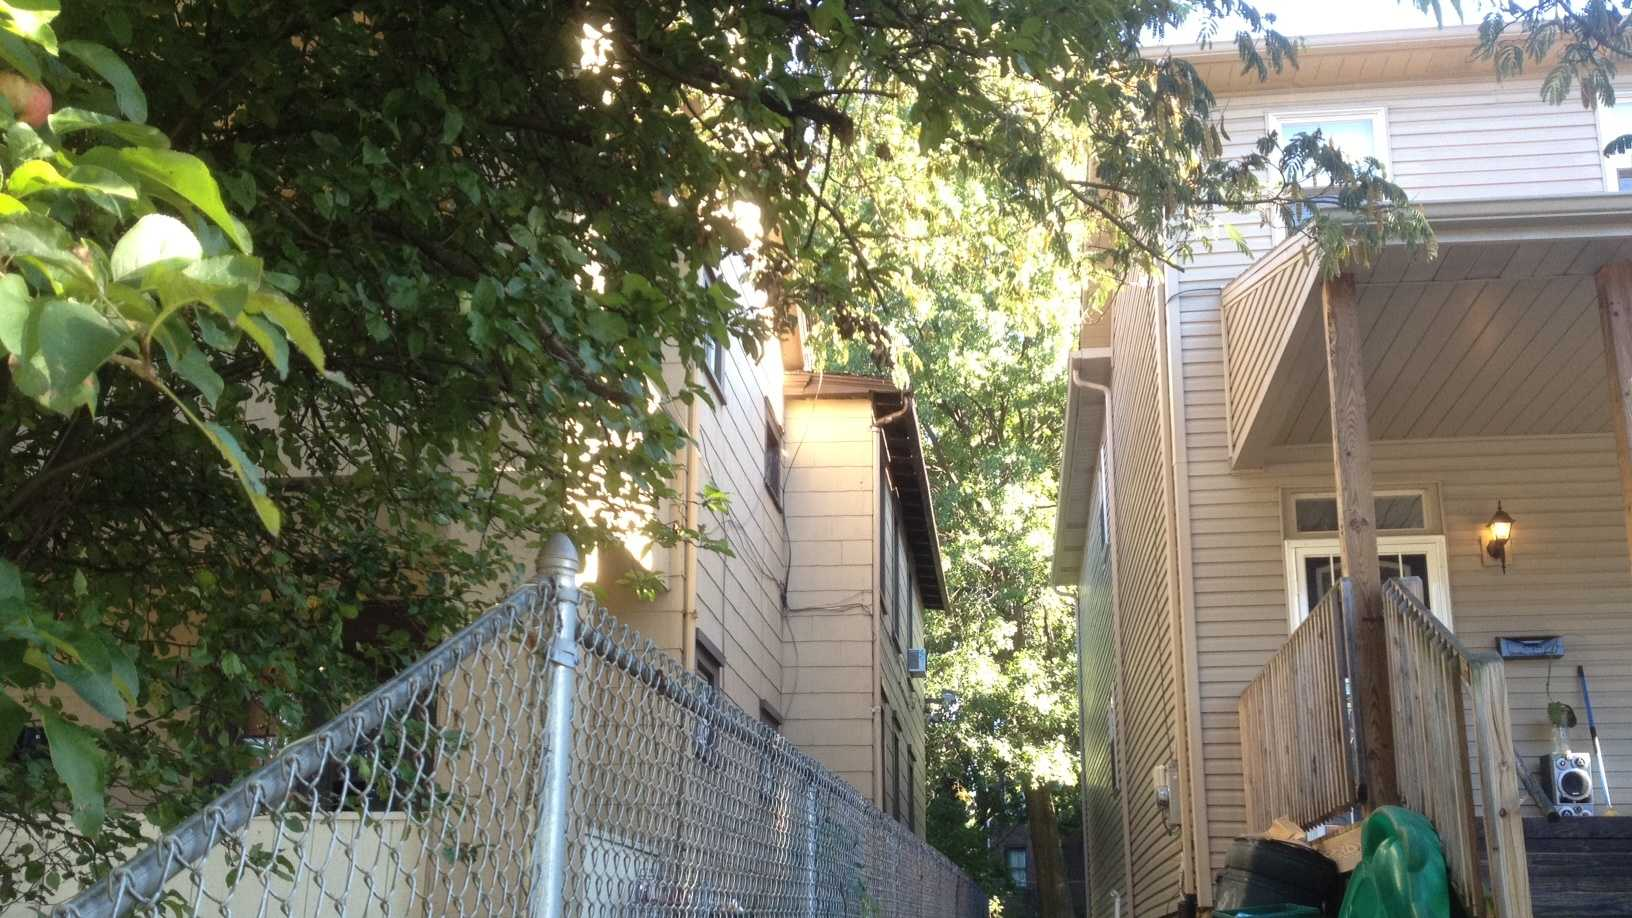 Wilkinsburg porch cut-through